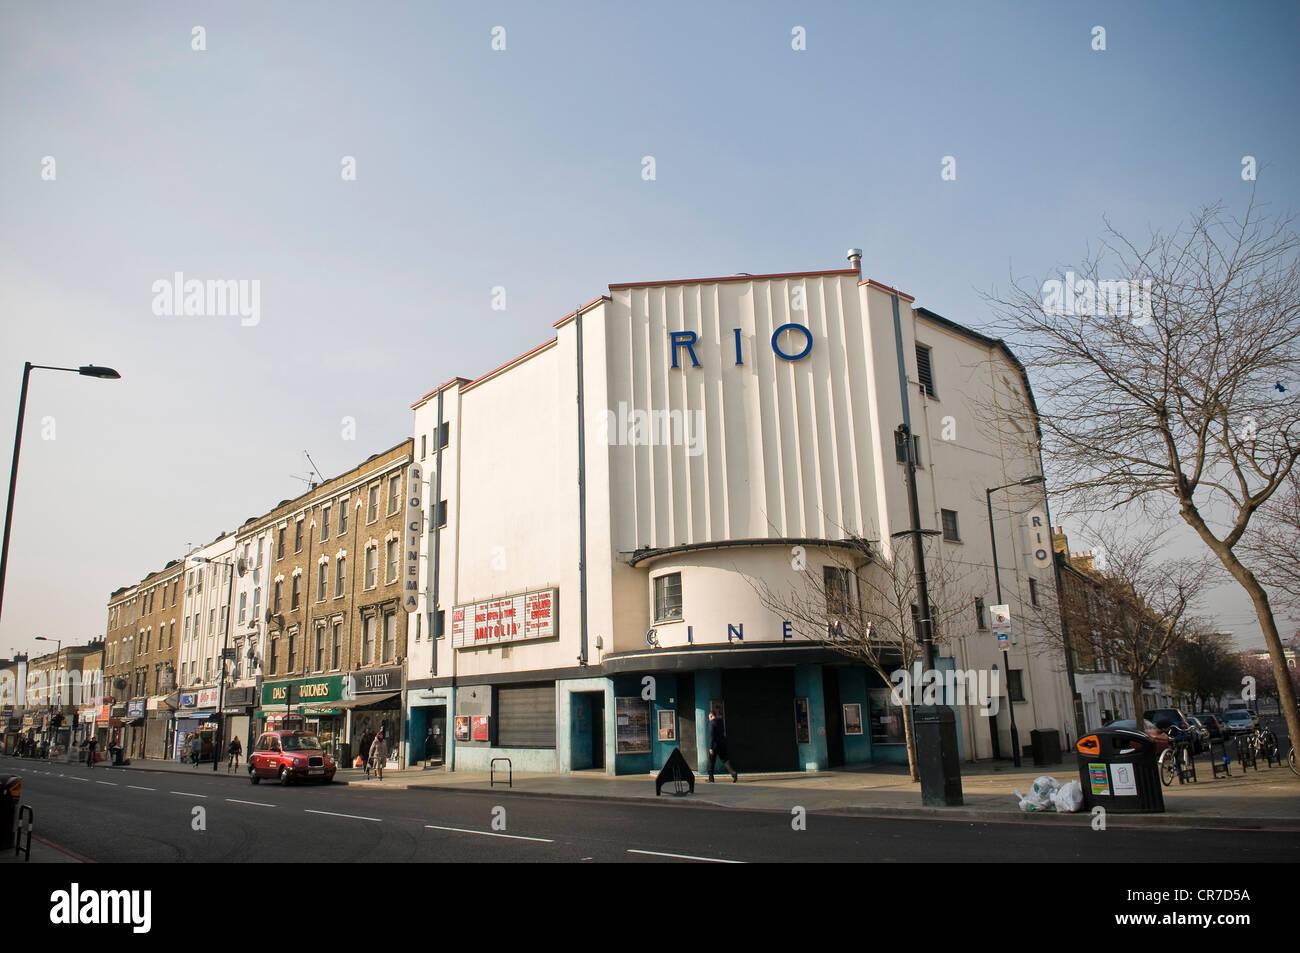 Die Rio-Kino am Kingsland High Street, Dalston, London, UK Stockbild